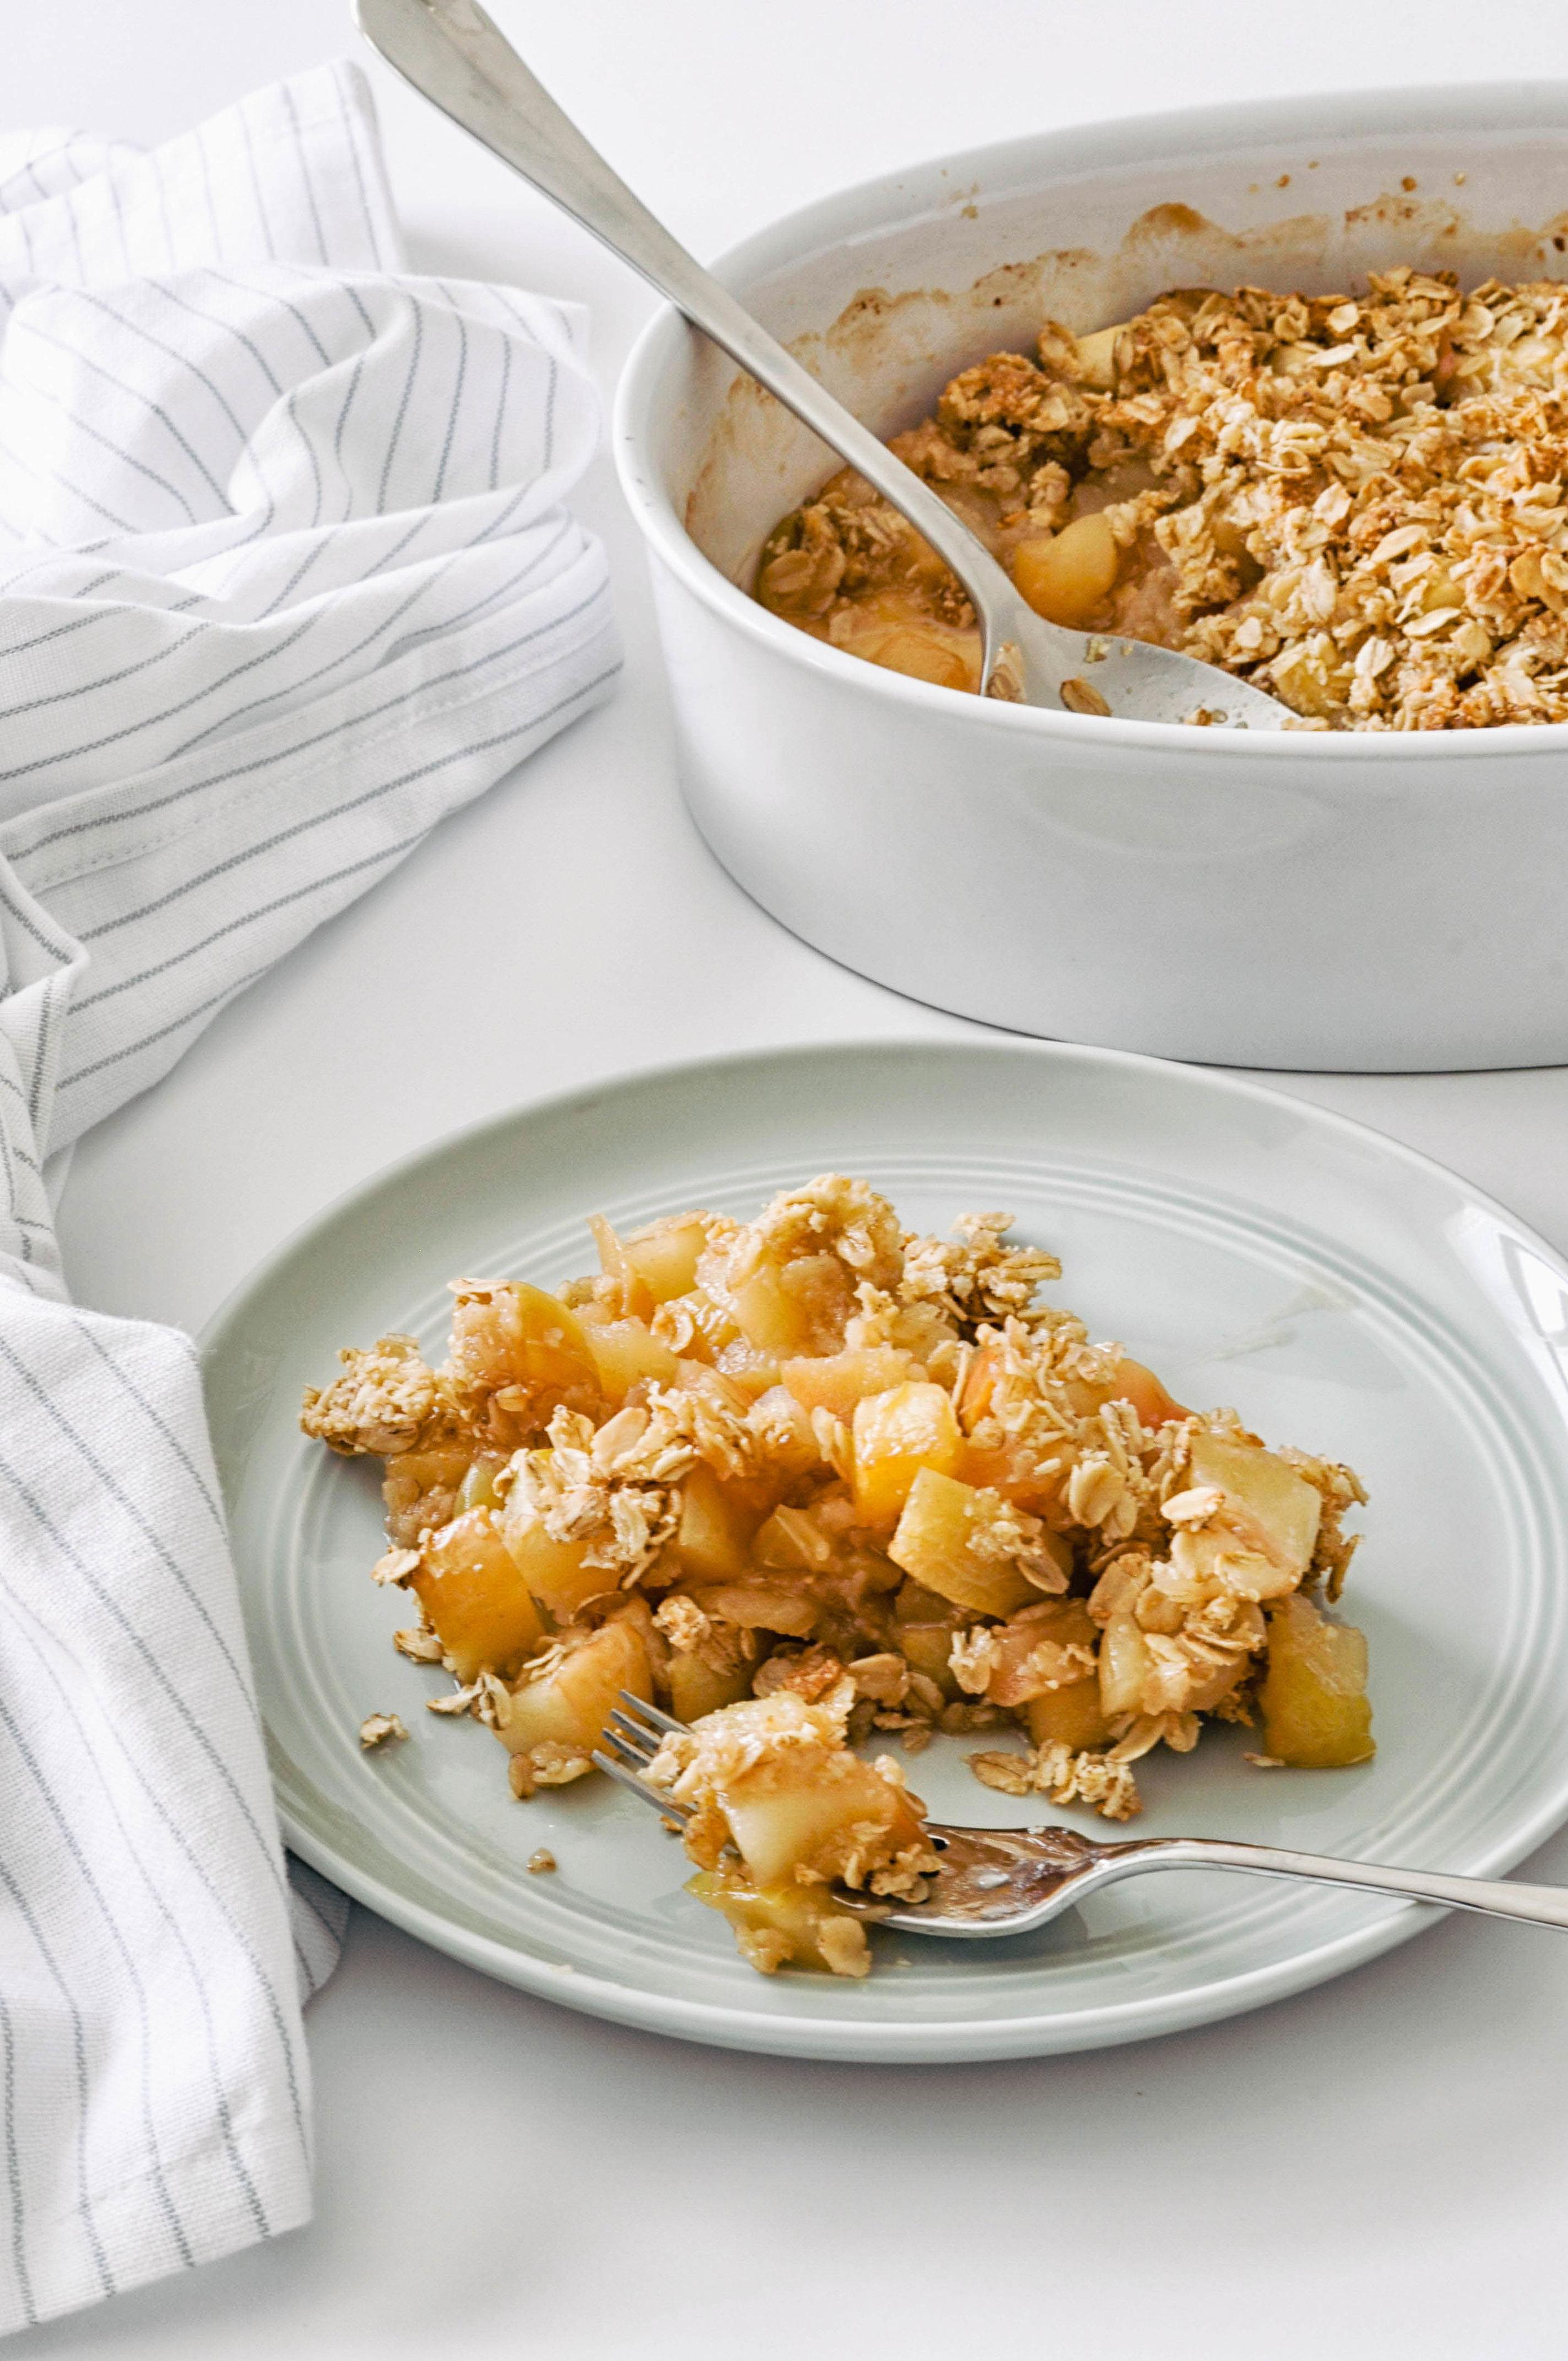 Caramelized Apple Crisp - a delicious autumn dessert | This Healthy Table